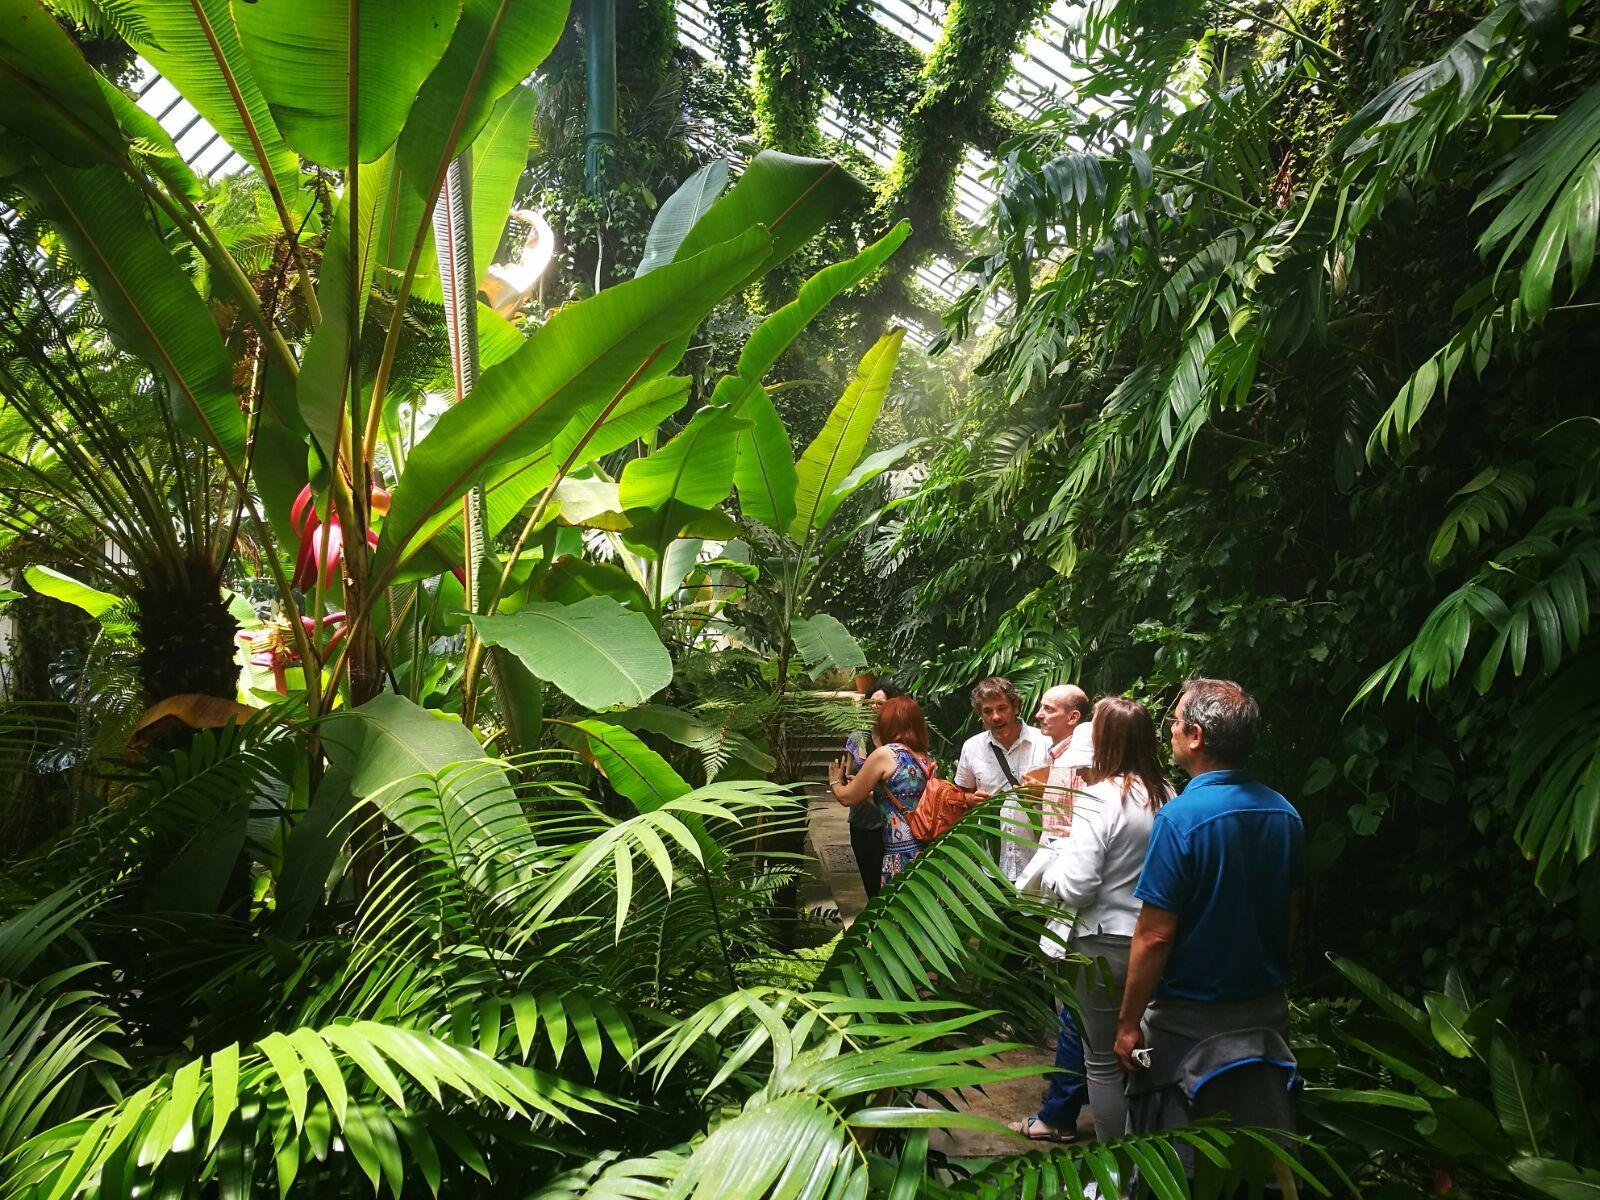 Visitas botánicas en Madrid